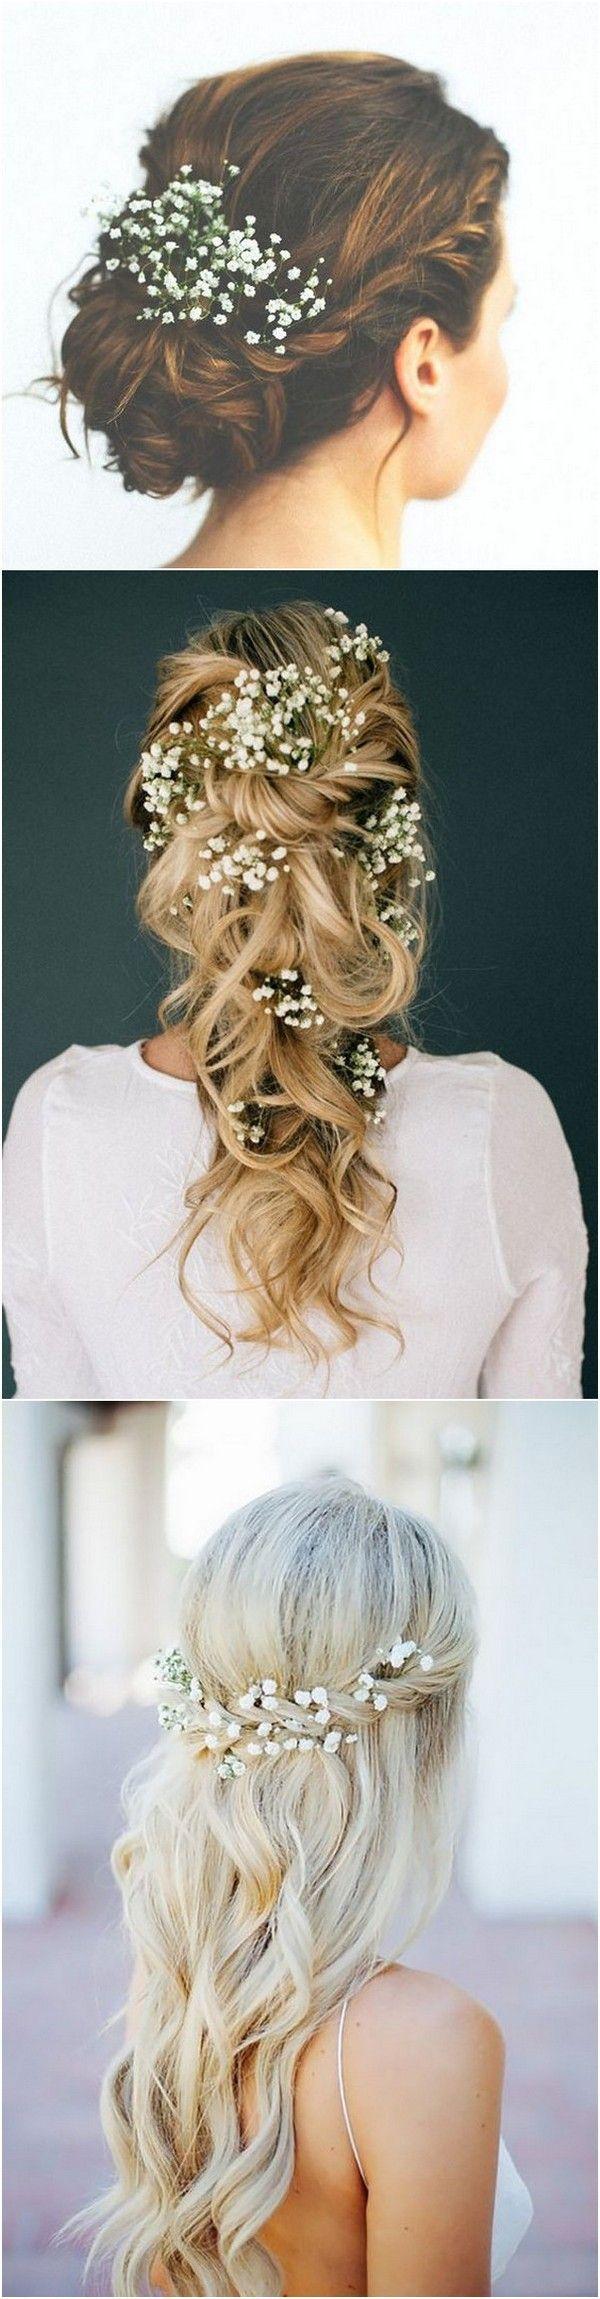 Wedding hairstyles with babyus breath hair styles pinterest